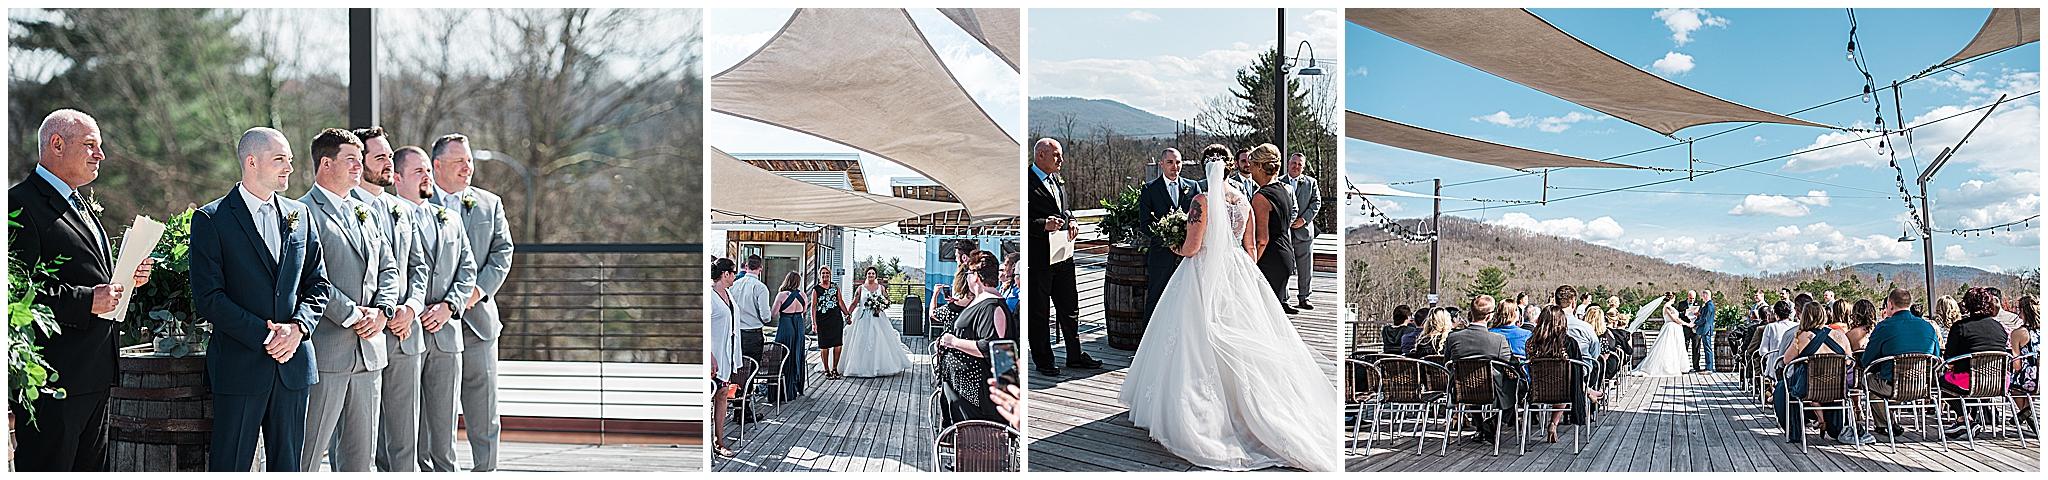 Wedding_Photographer_Asheville_Highland_Brewing_0011.jpg